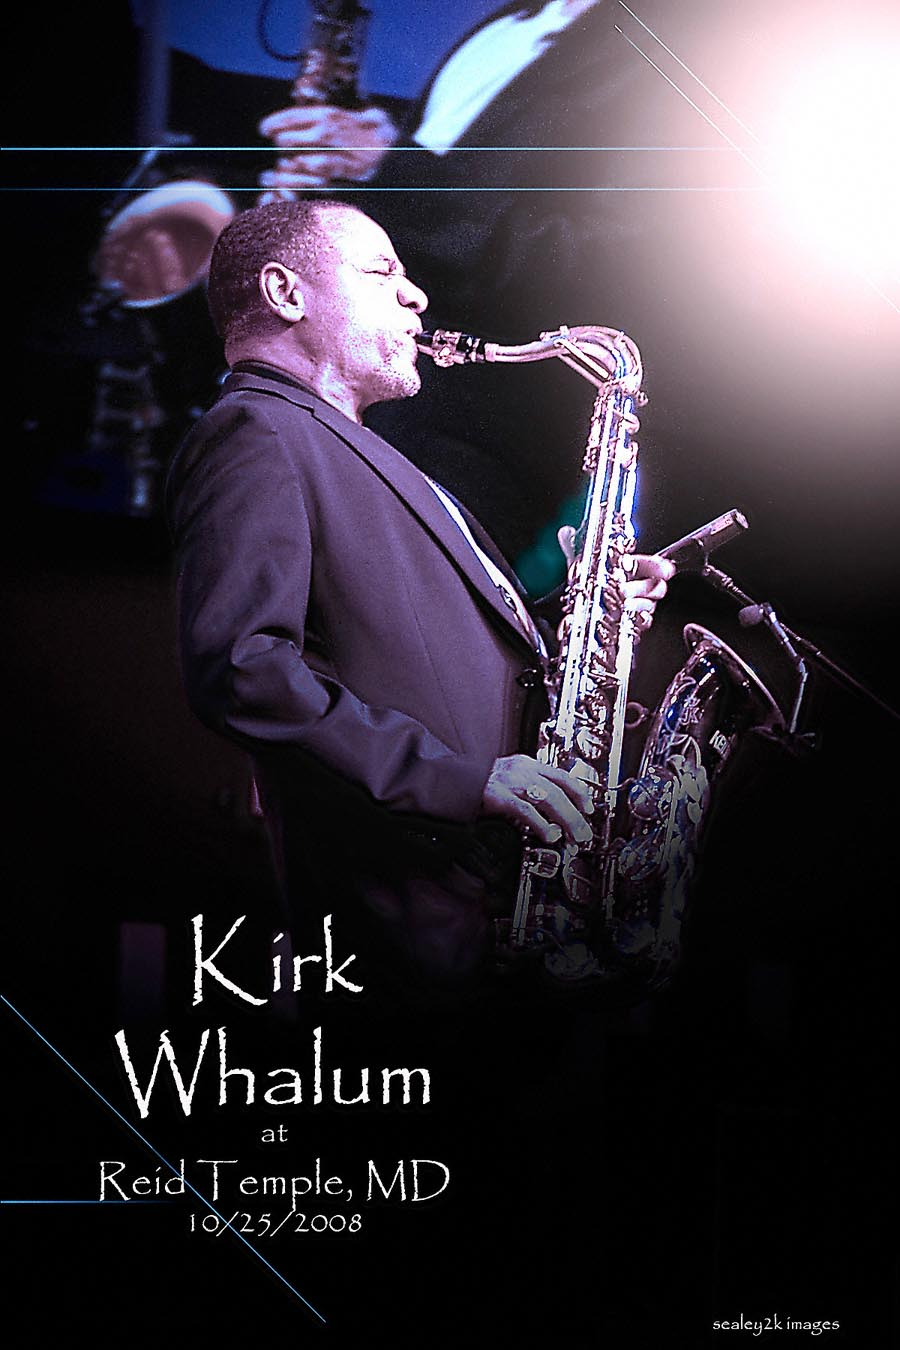 Kirk Whalum at Reid Temple (MD) 2008